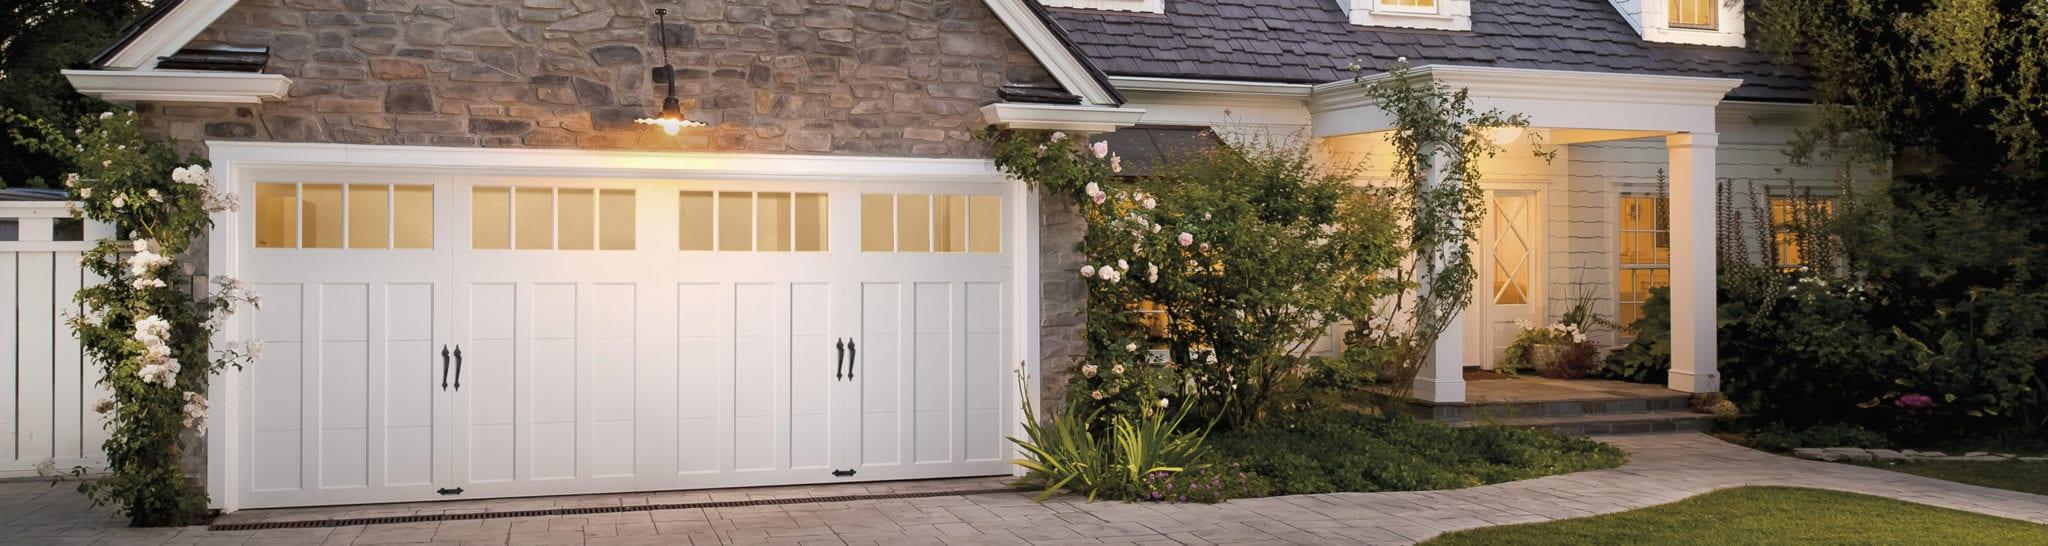 Carriage Style Garage Doors